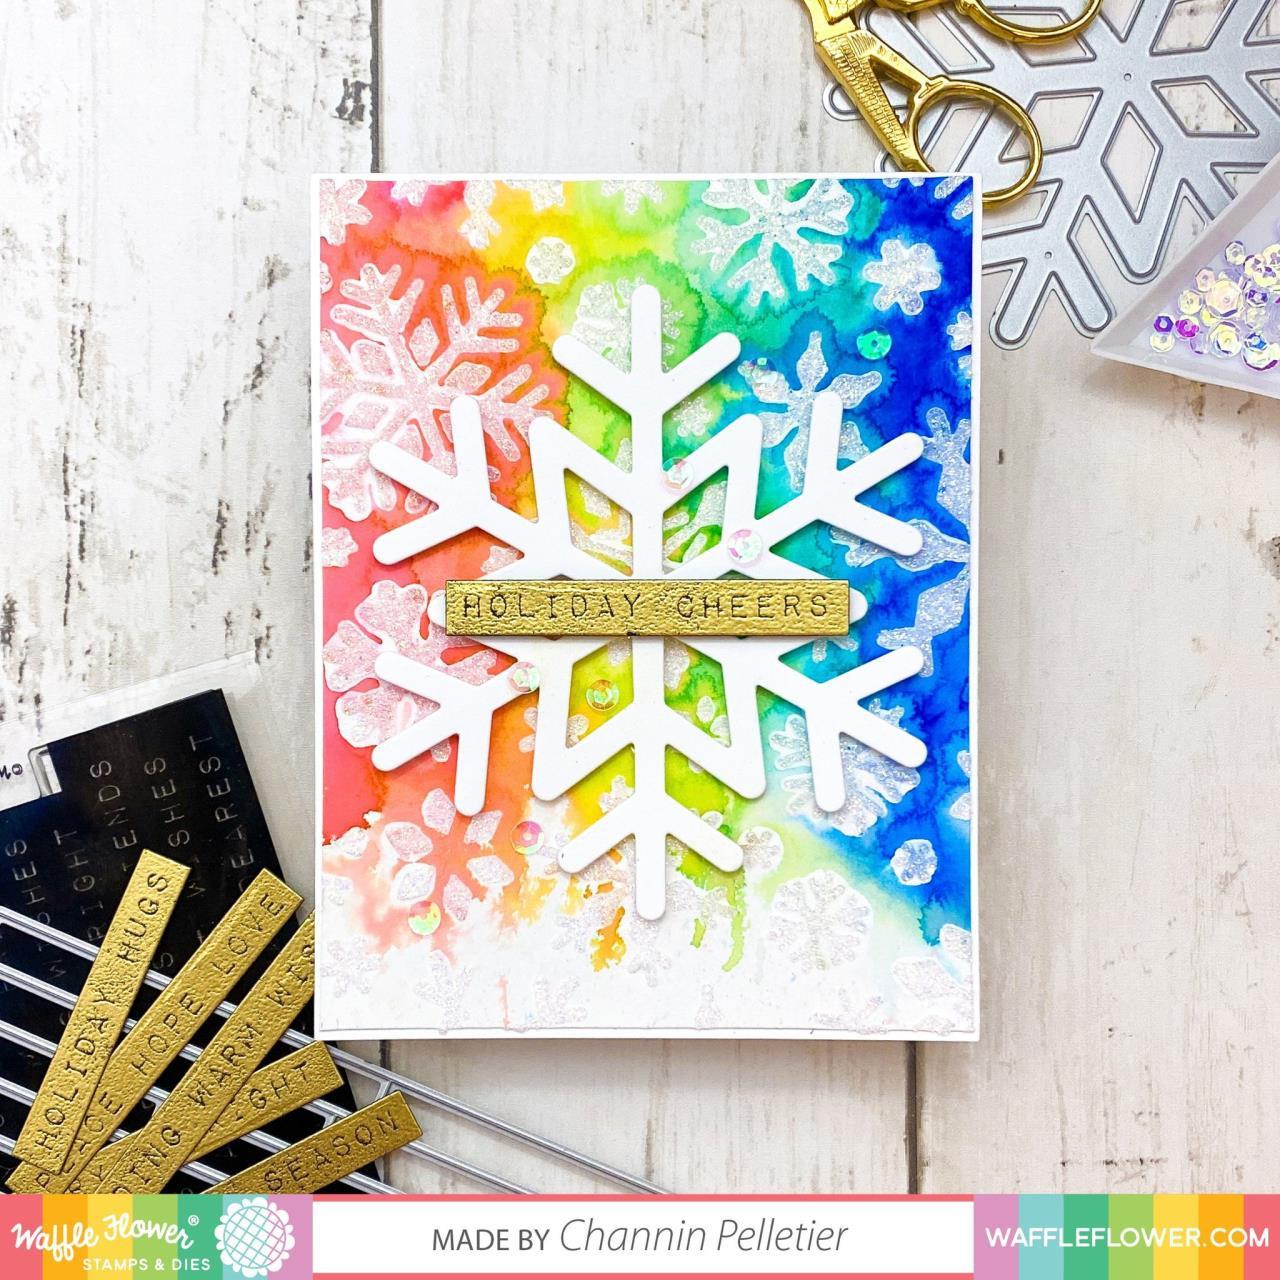 Snowflake Background, Waffle Flower Stencils -